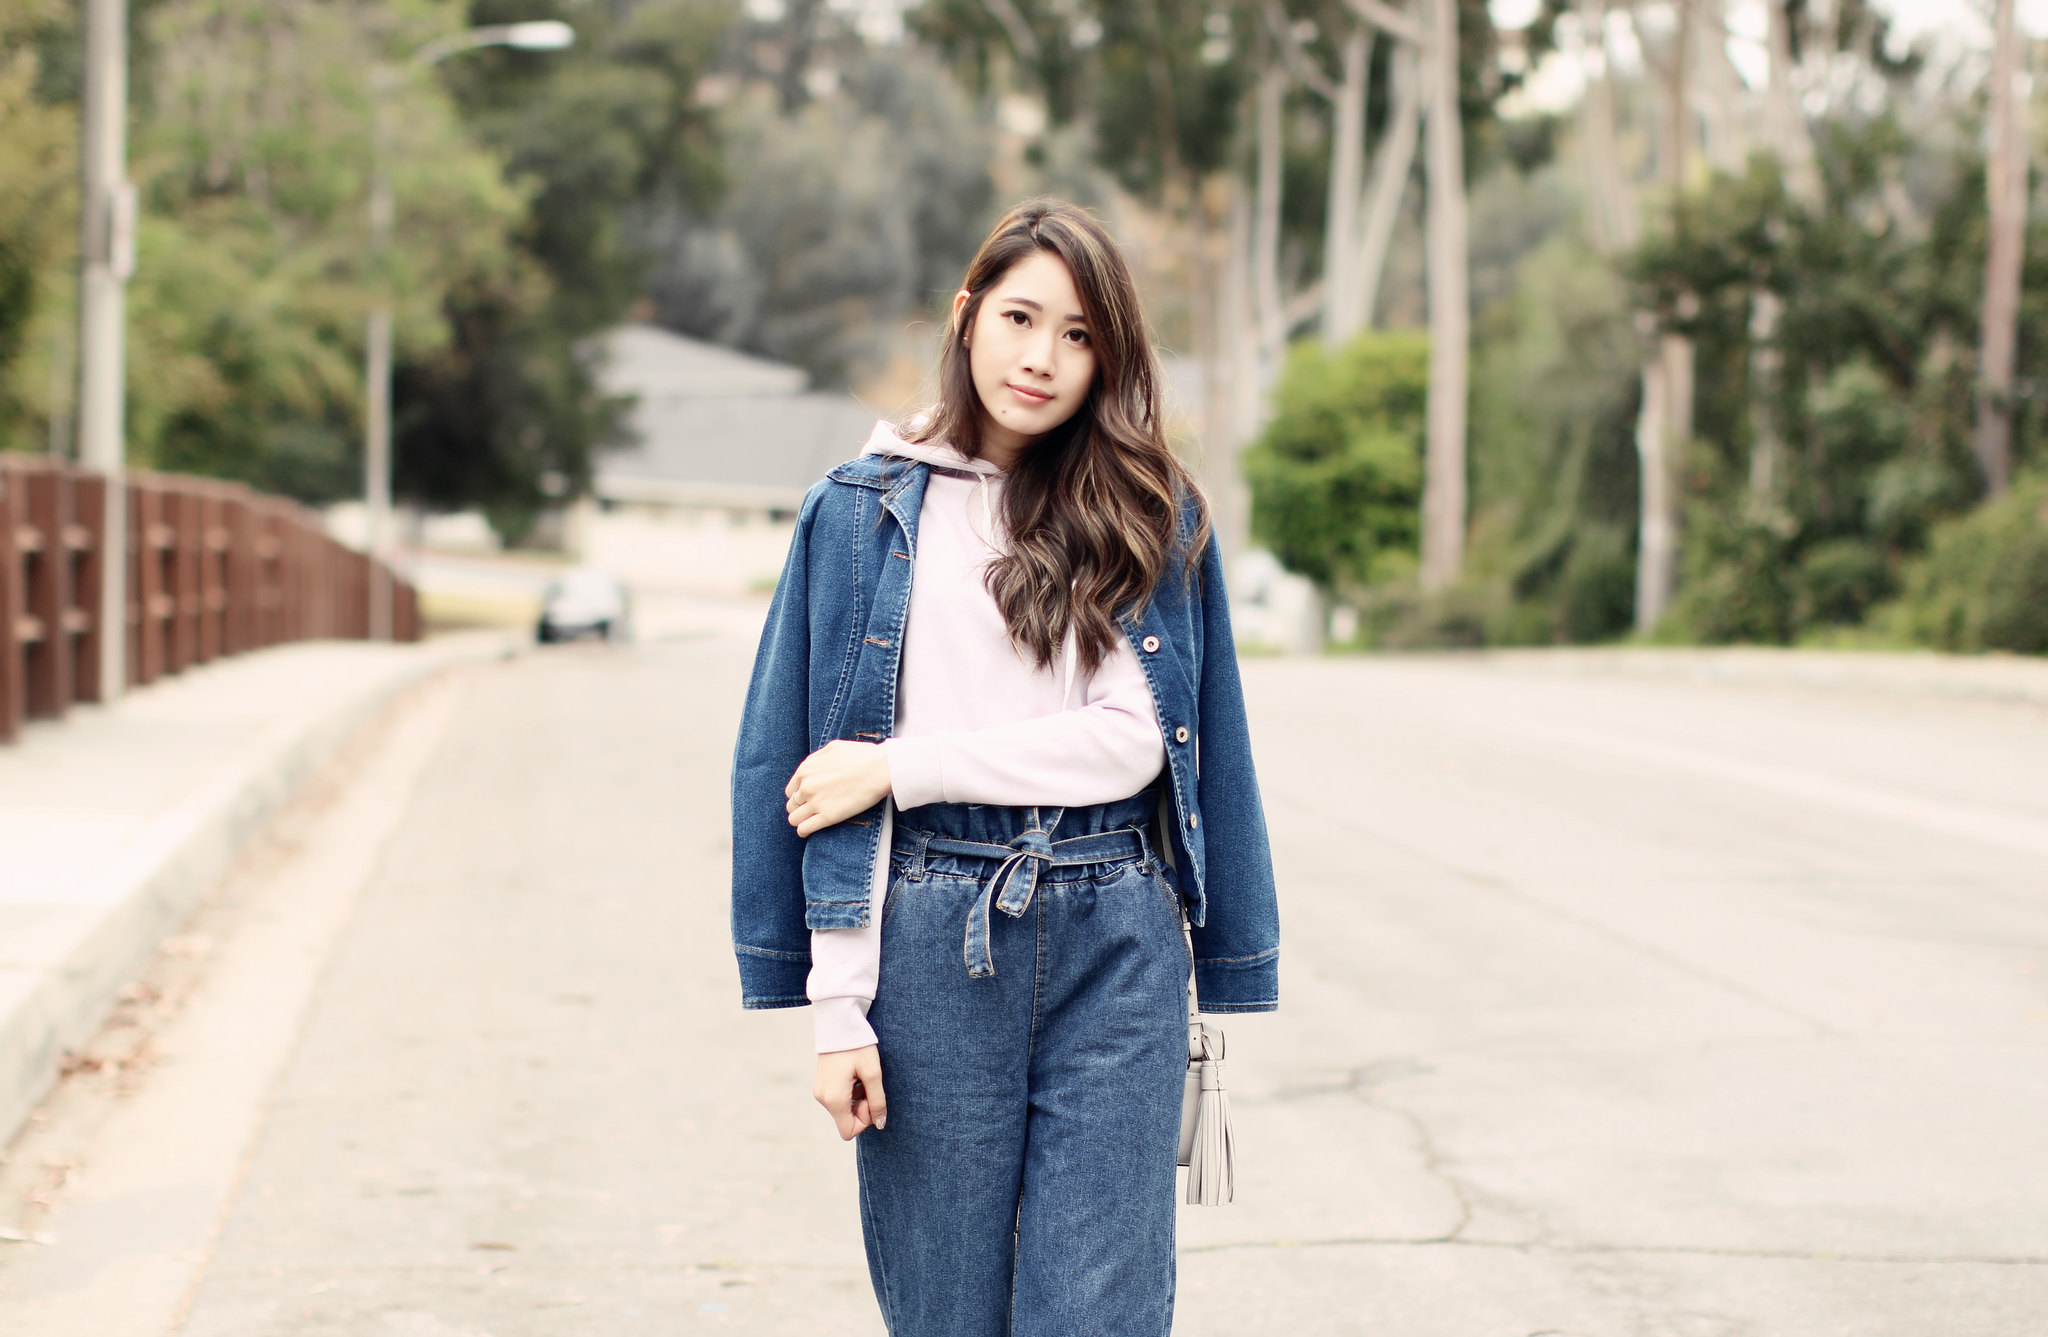 5088-ootd-fashion-style-outfitoftheday-wiwt-streetstyle-zara-f21xme-denim-thrifted-guess-koreanfashion-lookbook-elizabeeetht-clothestoyouuu